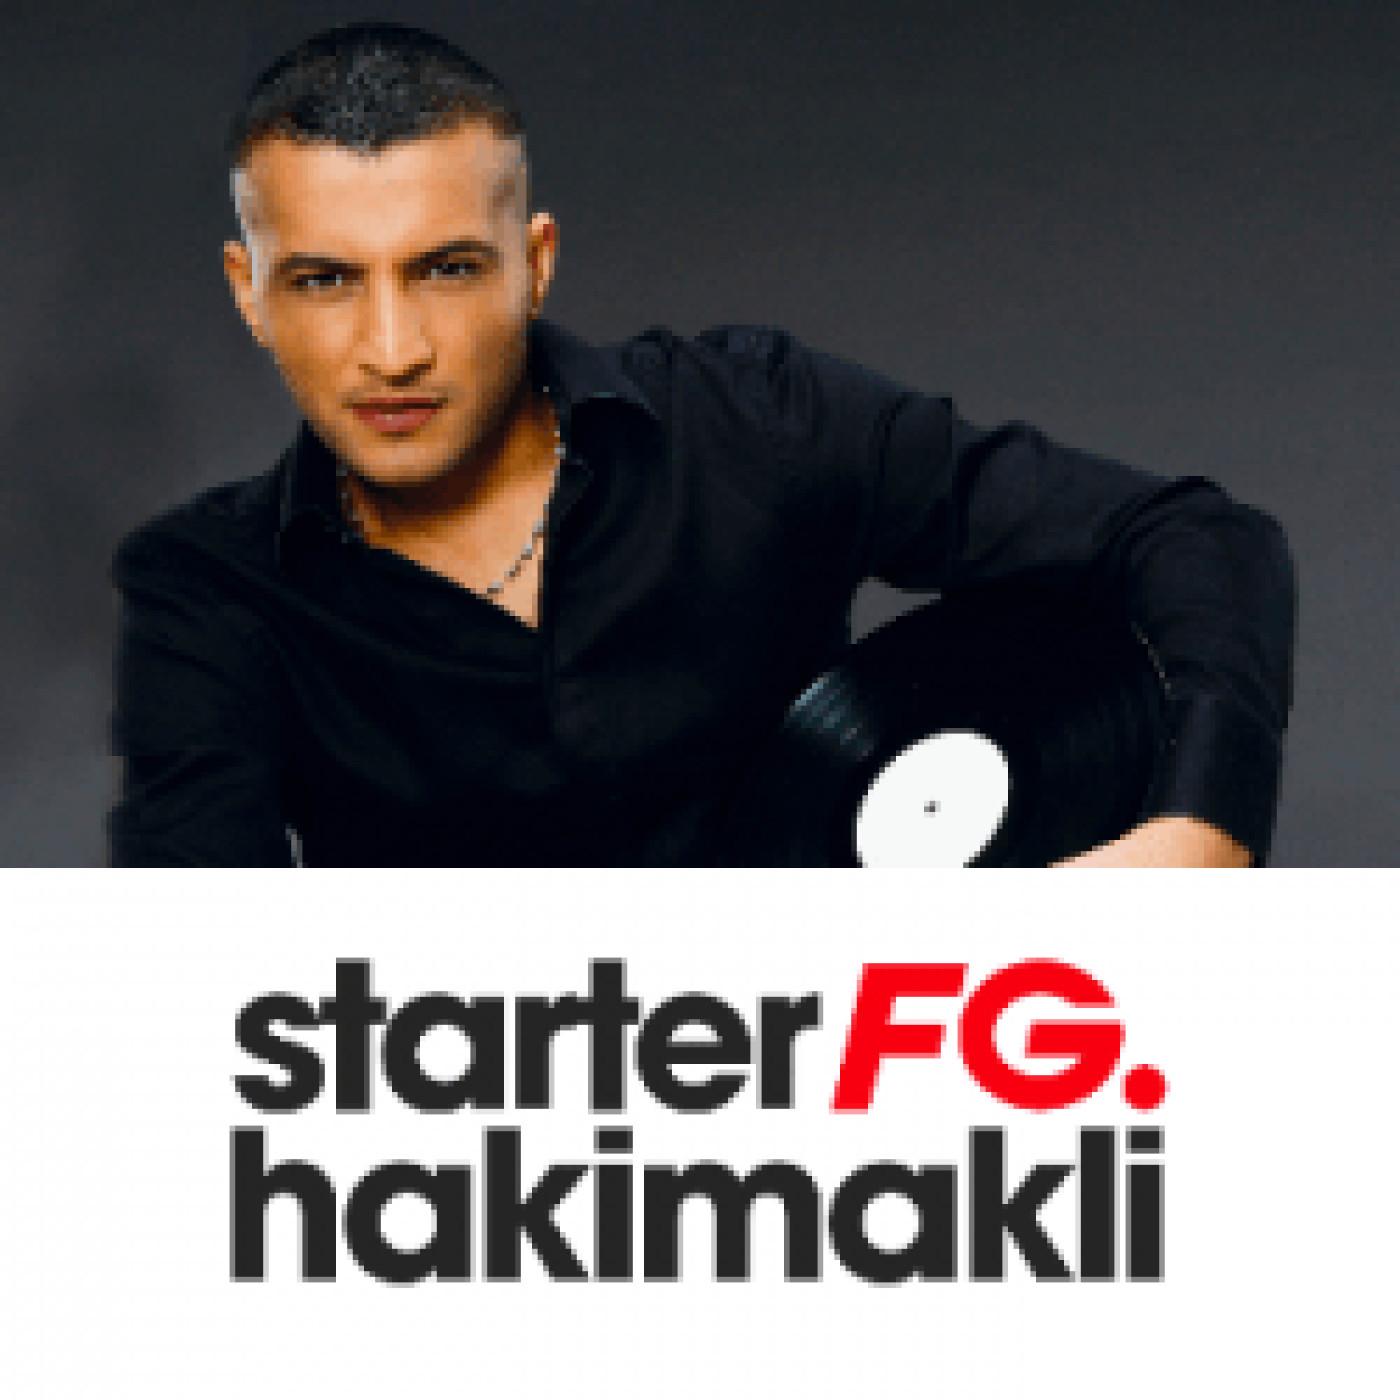 STARTER FG BY HAKIMAKLI MARDI 1er DECEMBRE 2020